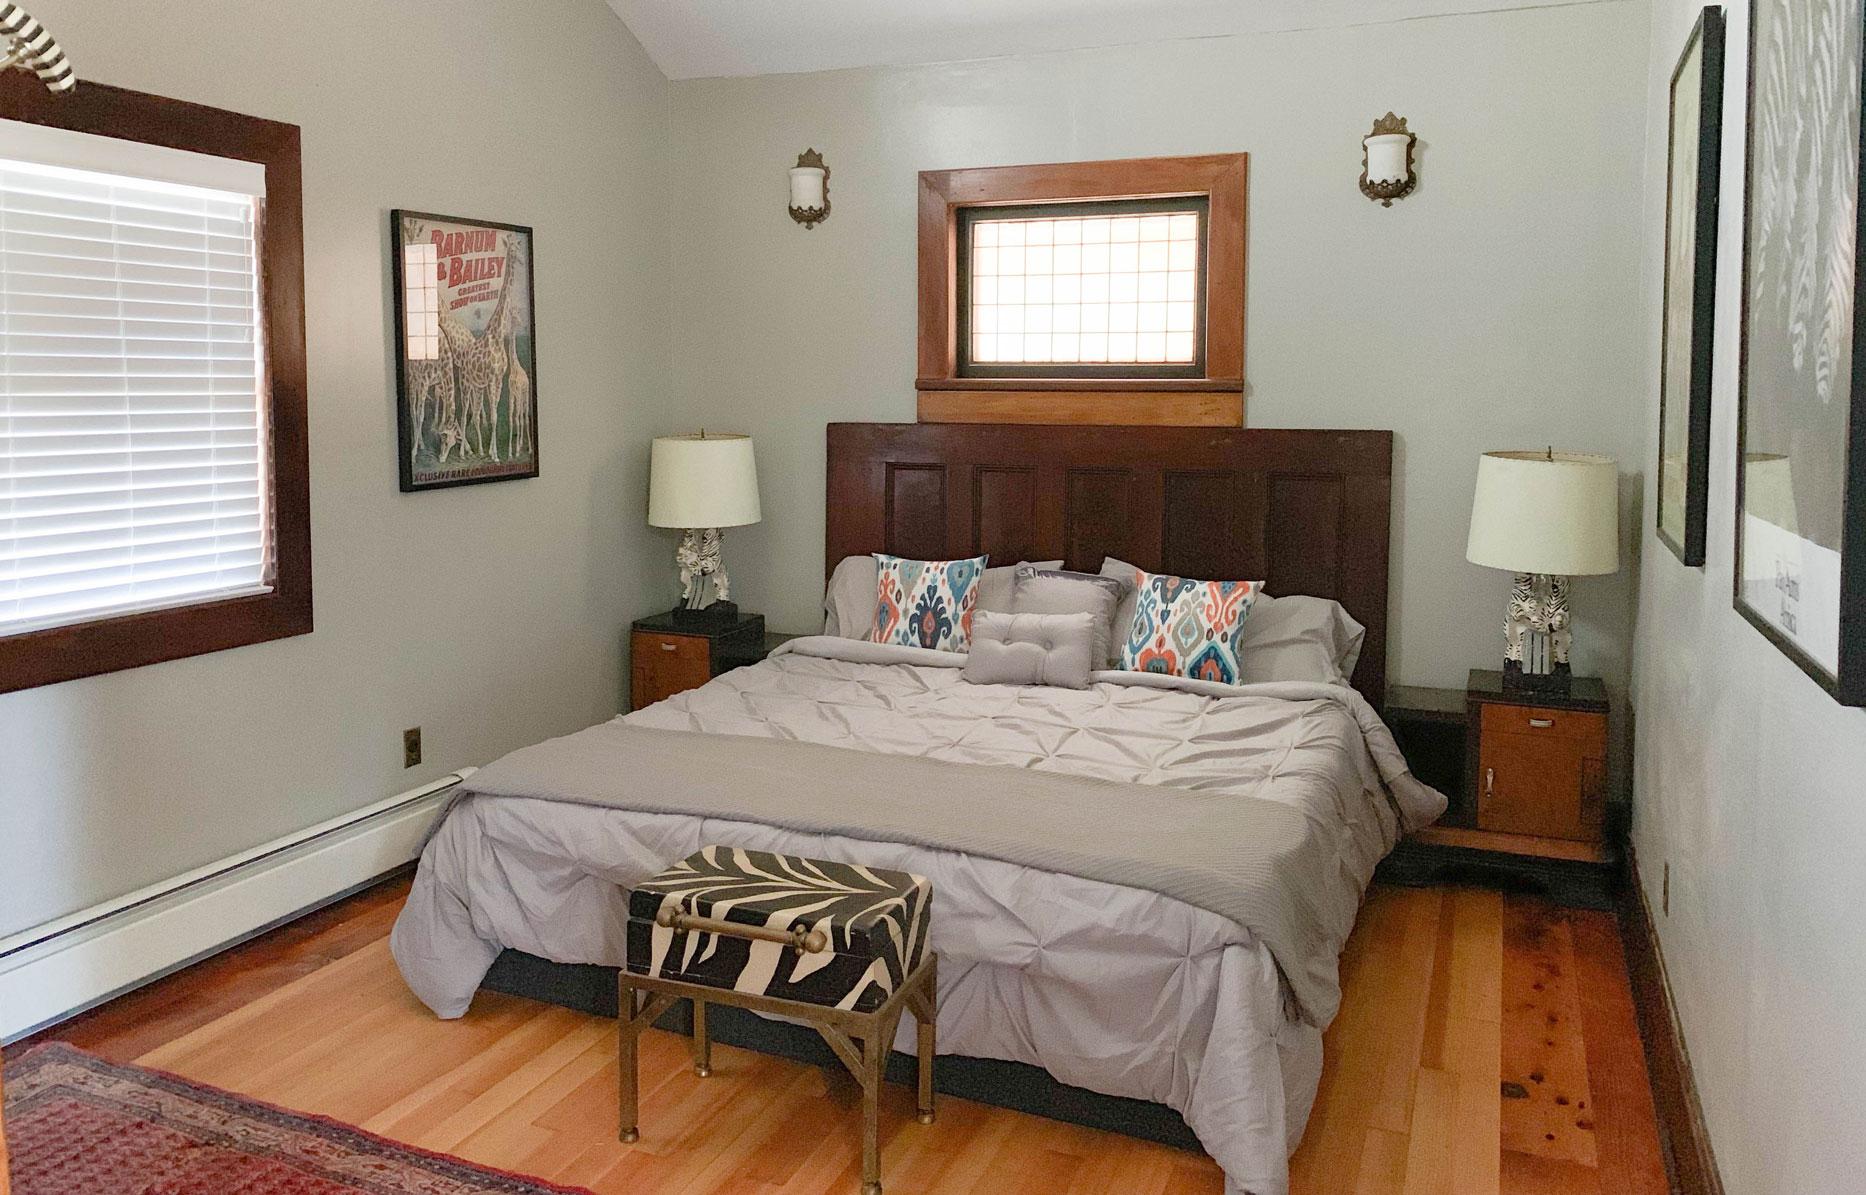 Zebra Cottage bedroom at B. Bryan Preserve on the Mendocino Coast